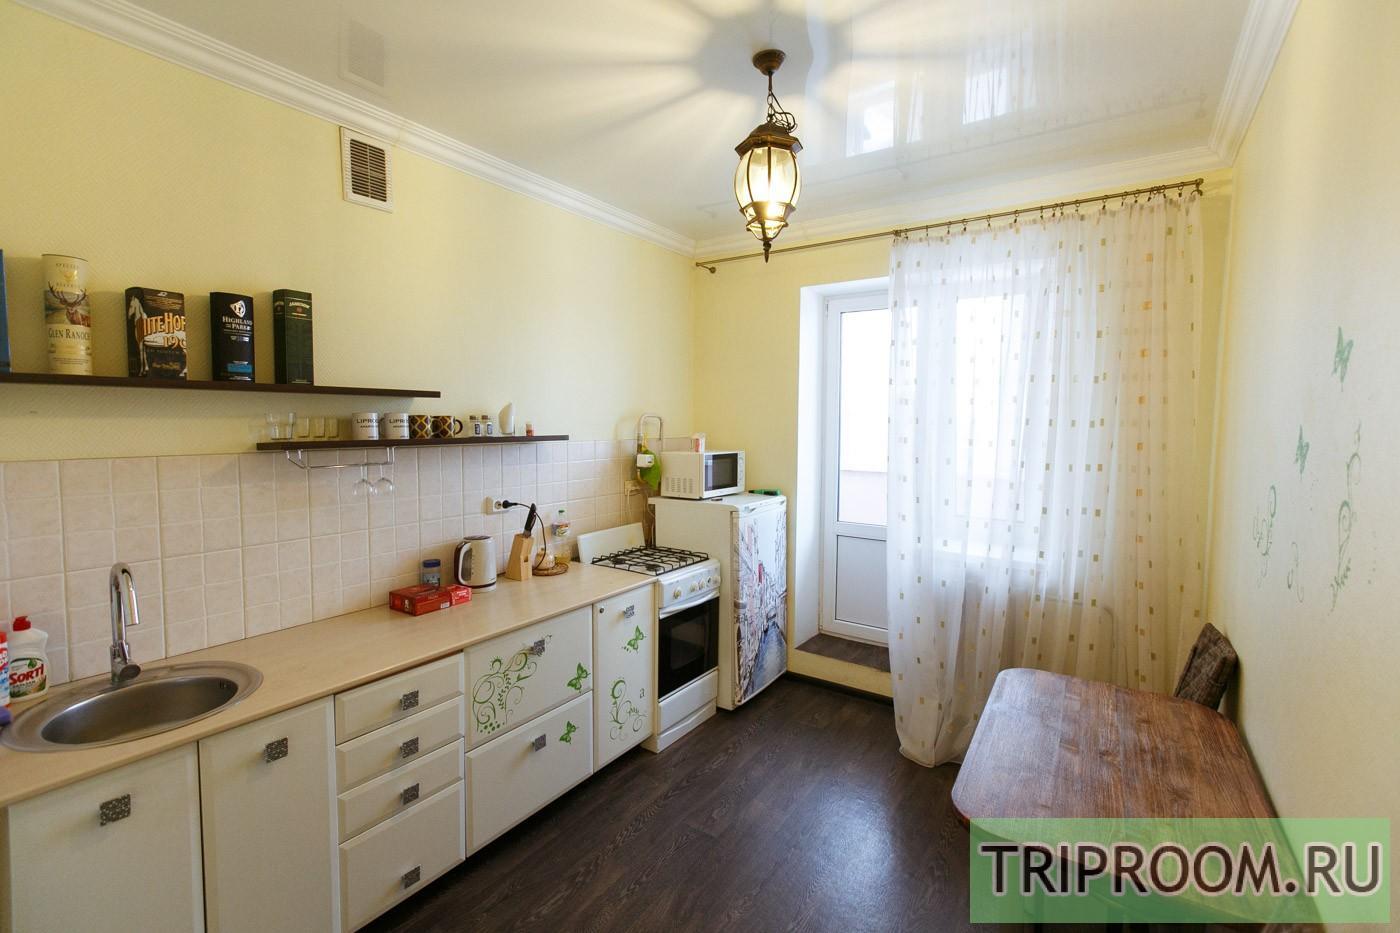 1-комнатная квартира посуточно (вариант № 28539), ул. П.И. Смородина, фото № 6